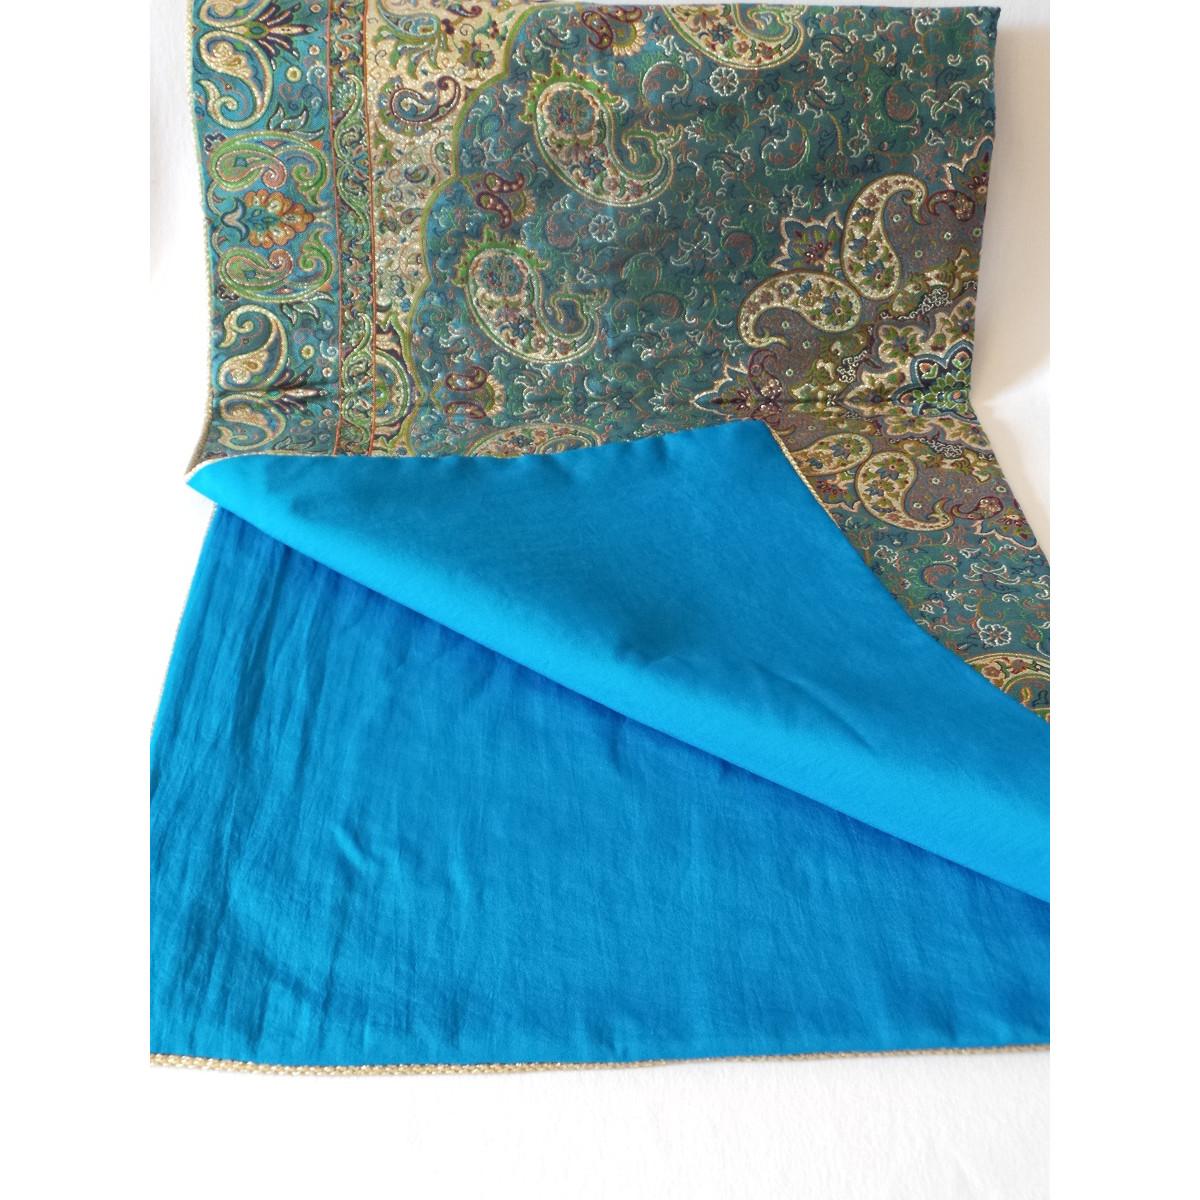 Termeh Luxury Tablecloth - HT2064-Persian Handicrafts